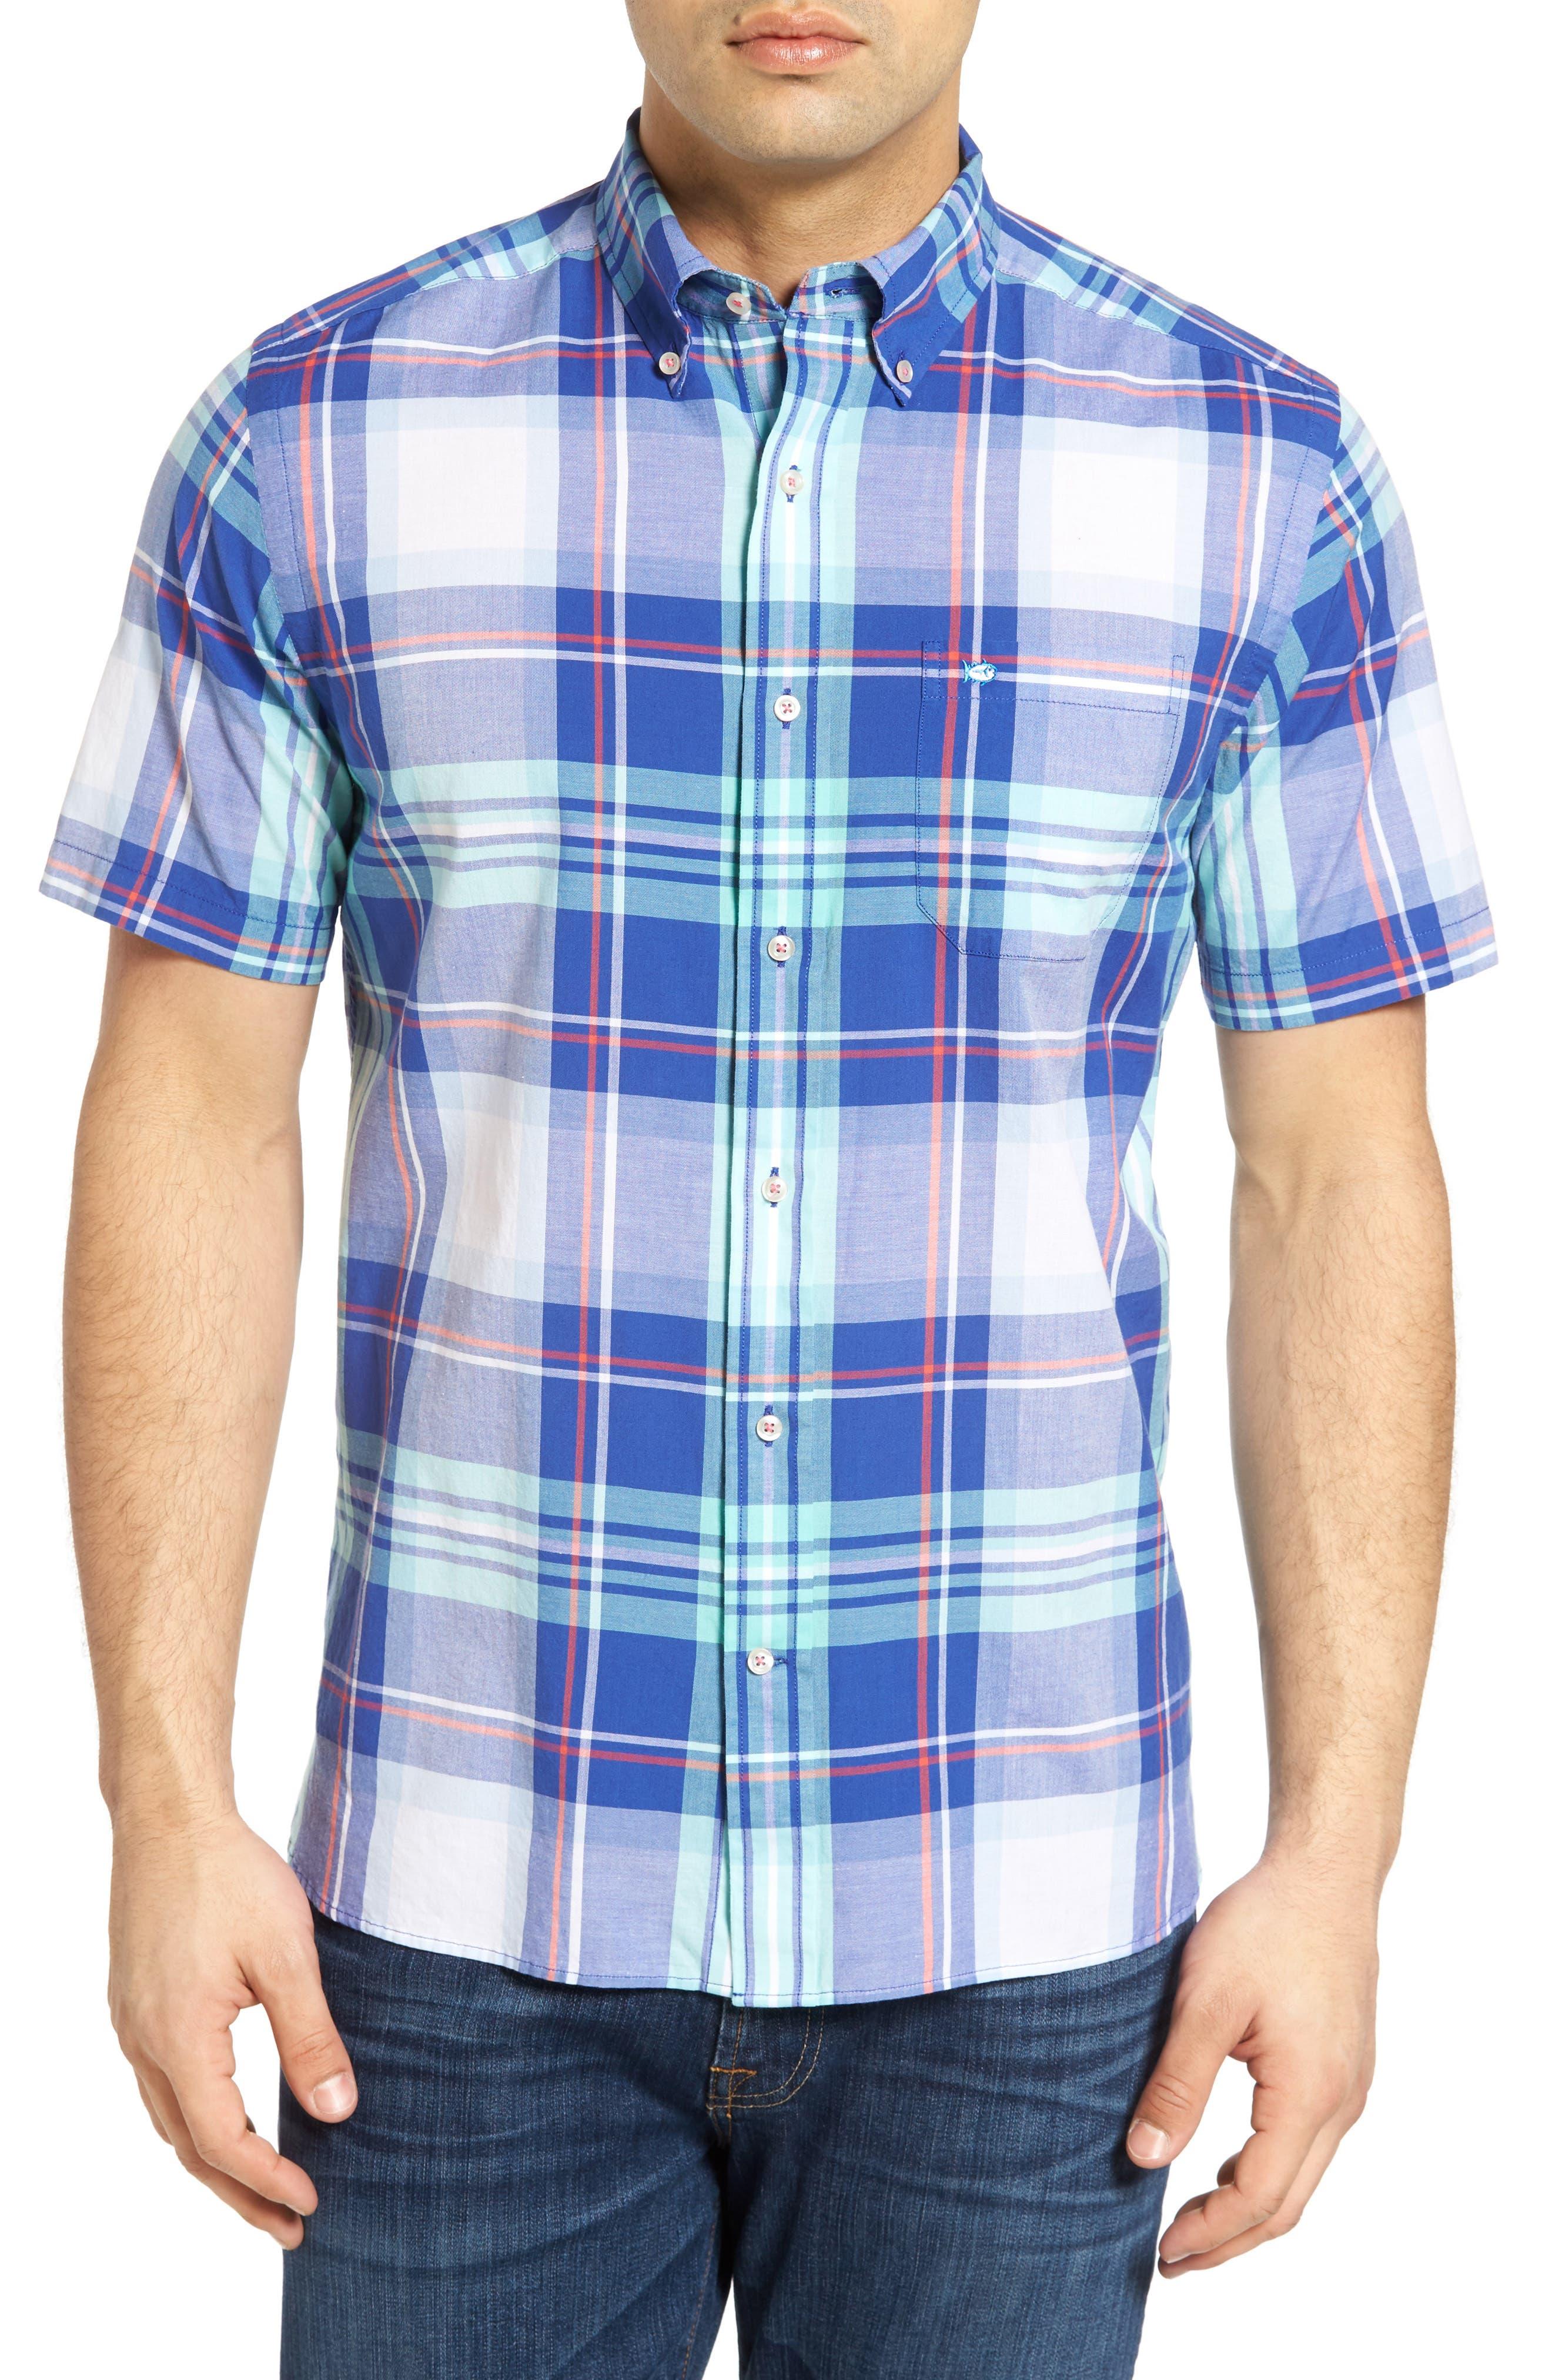 SOUTHERN TIDE Magnolia Classic Fit Plaid Short Sleeve Sport Shirt